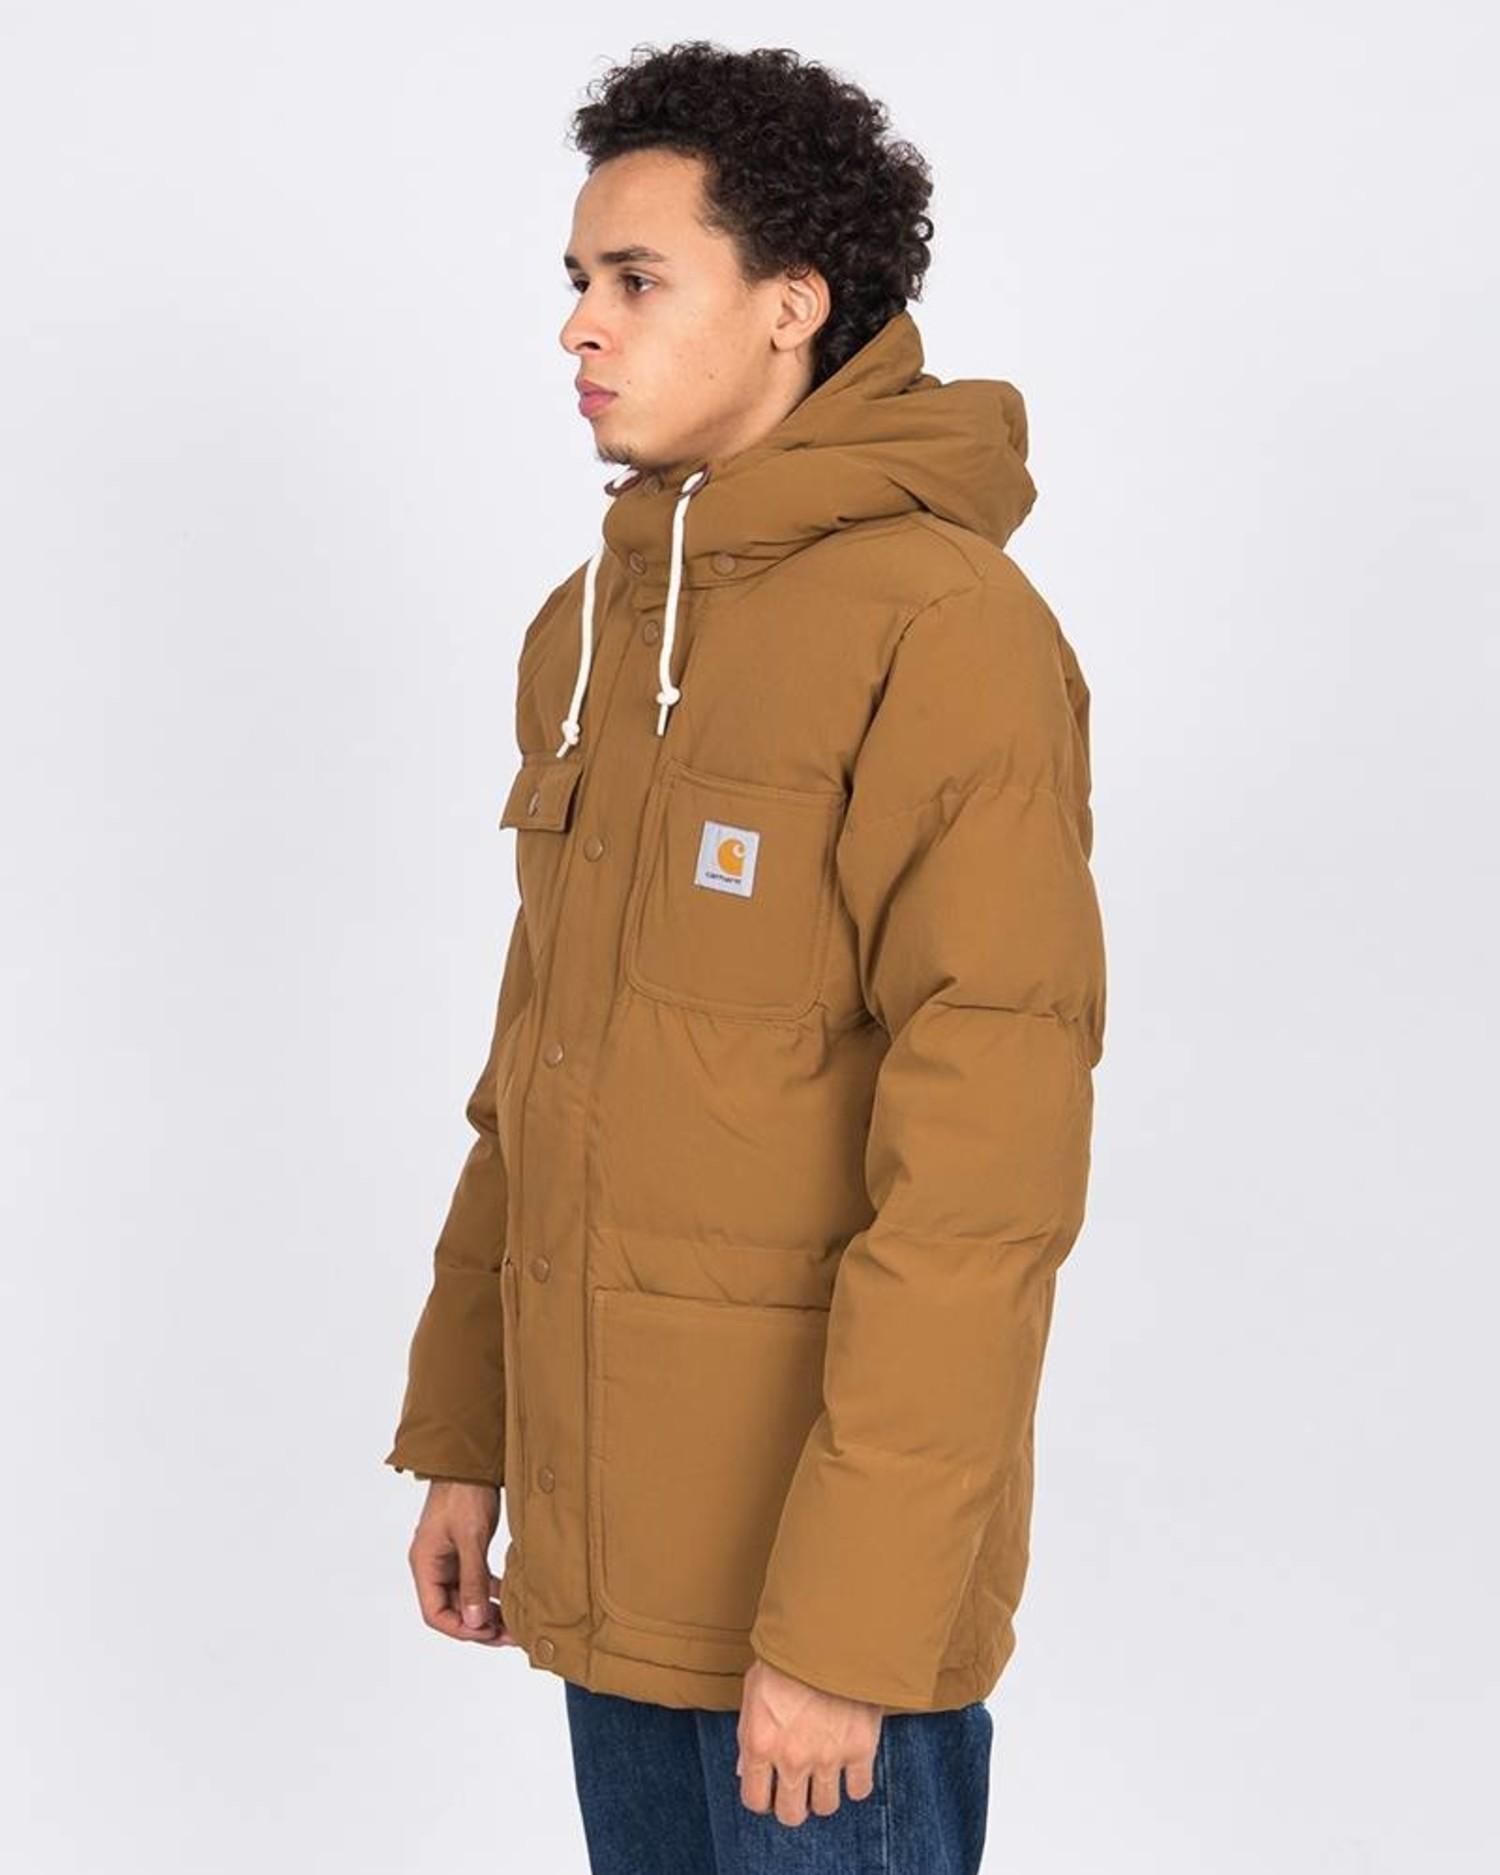 Carhartt Alpine Coat Hamilton Brown/Black